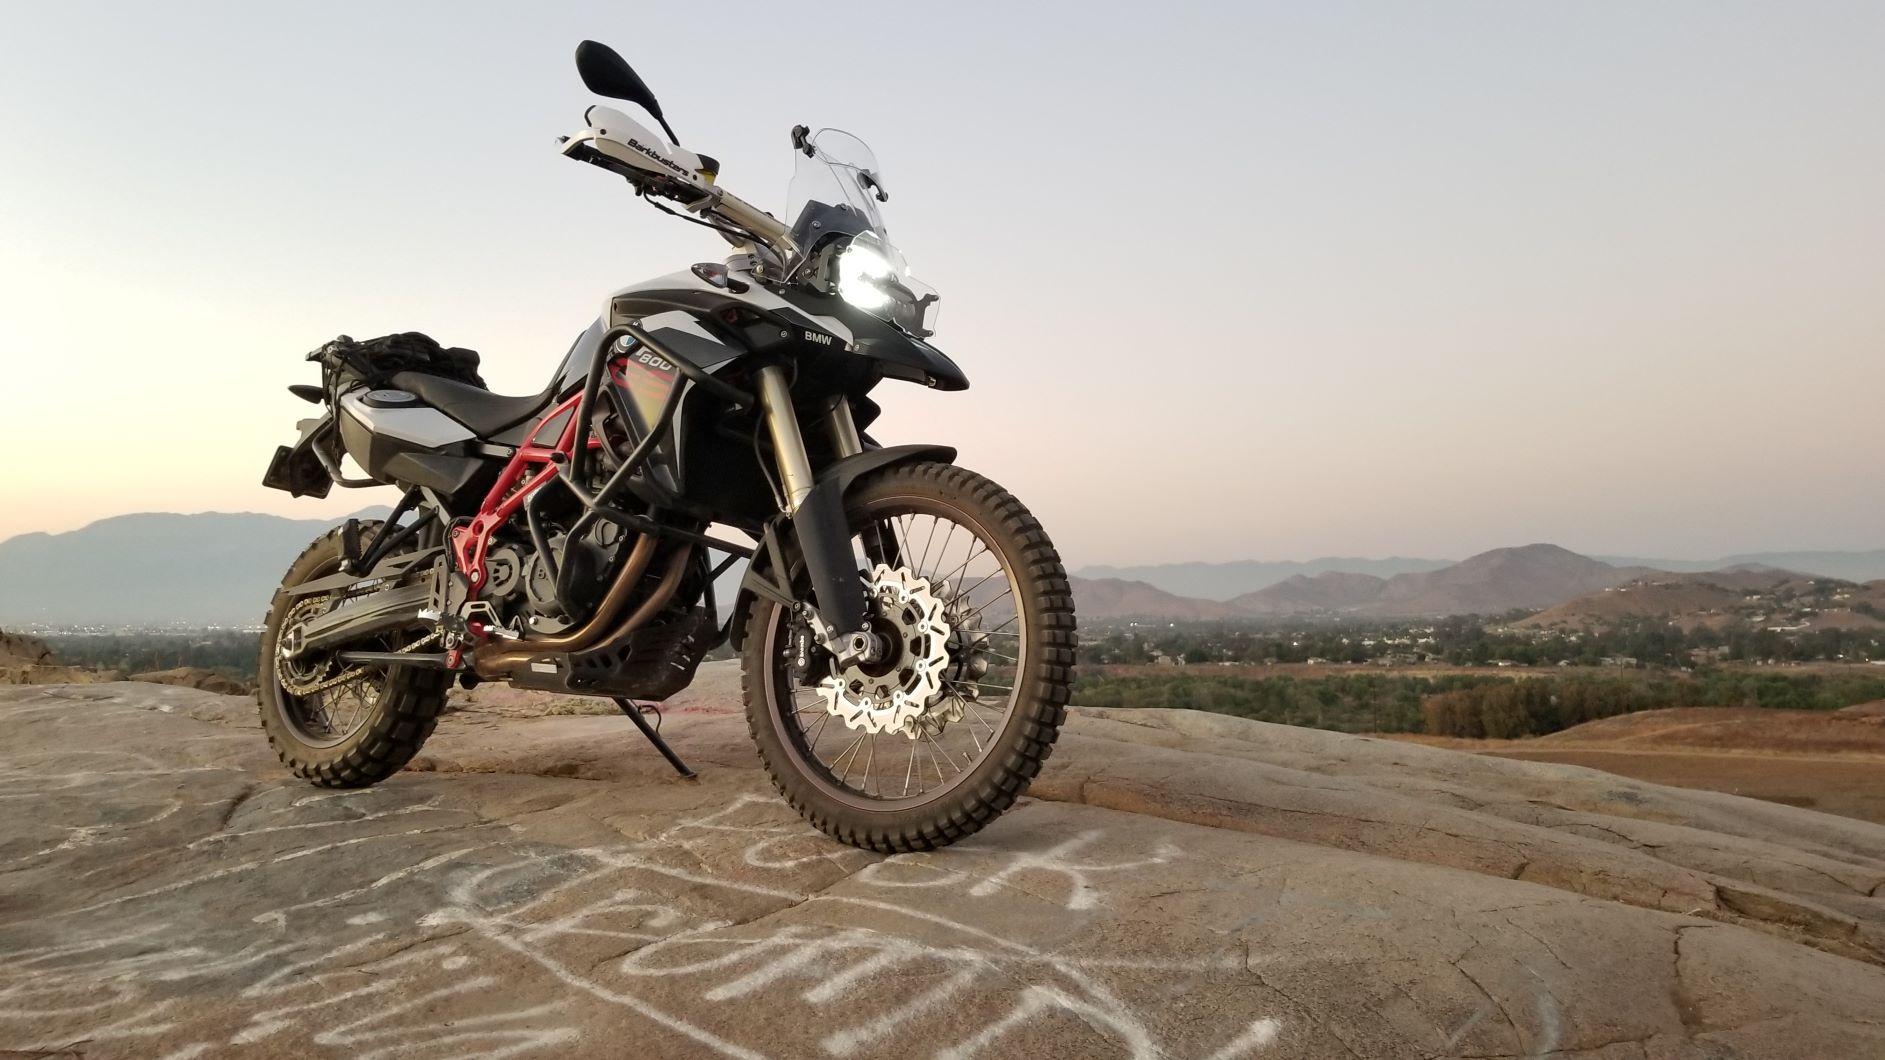 bmw f800gs, f800gs, f800, albes adv, albe's adv, adventure bike